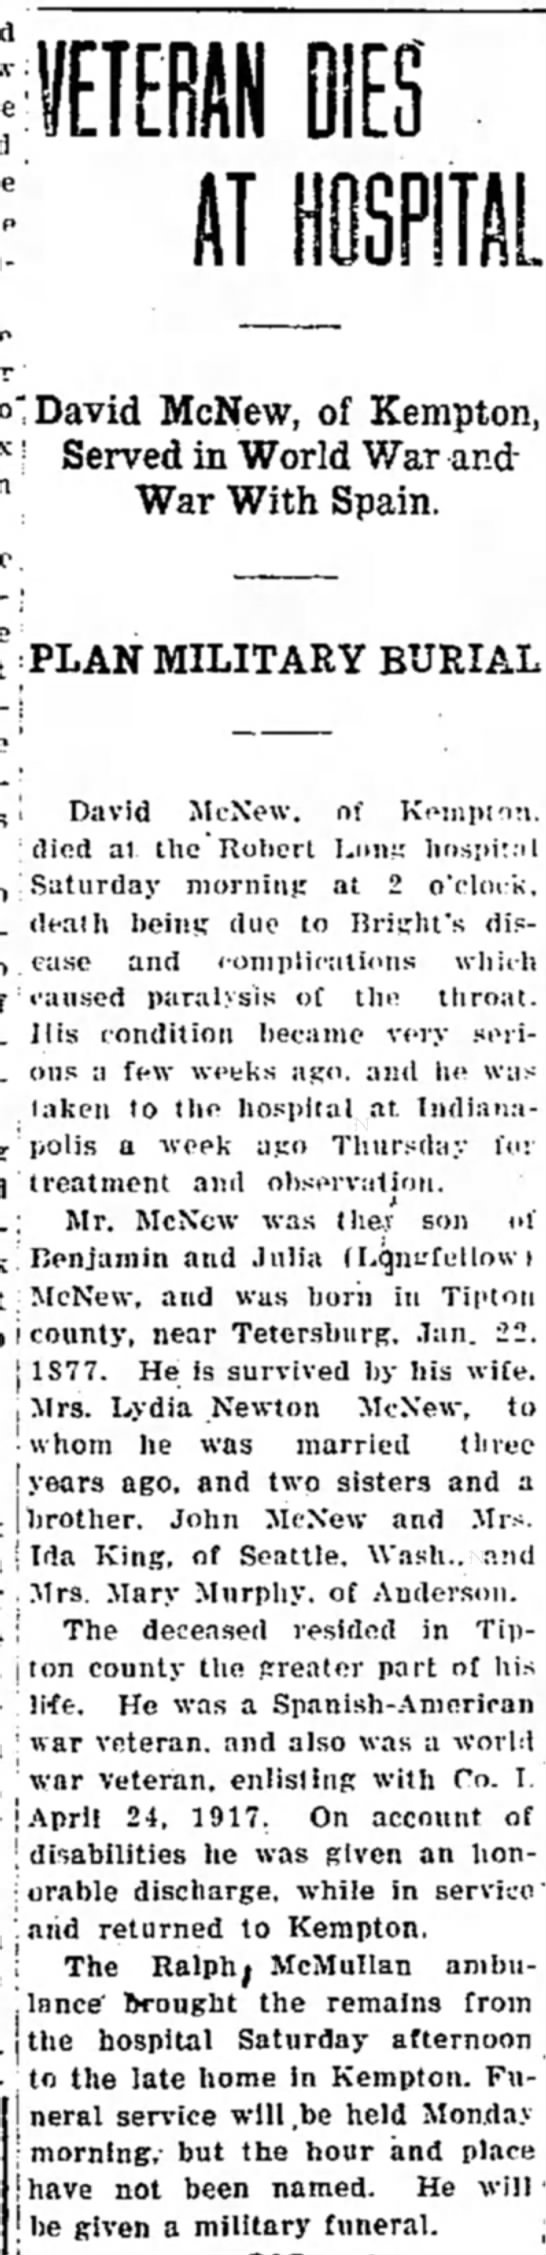 Tipton Tribune, Dec. 27, 1930 page 1 - David McNew, of Kempton, j AT HOSPITAL Served...